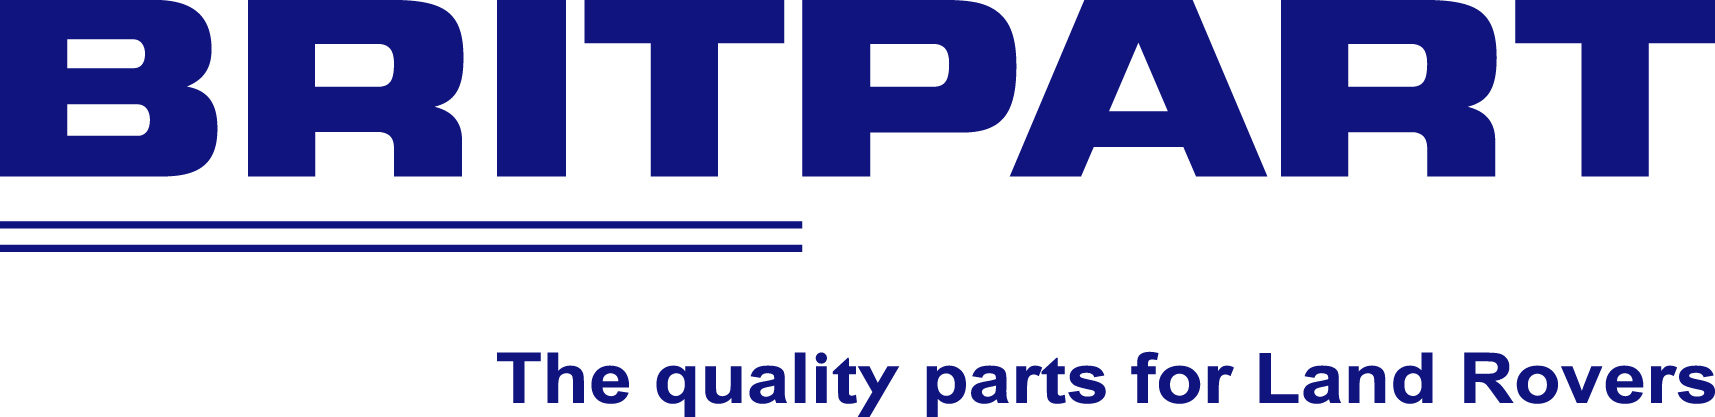 Britpart Calendar Competition - logo